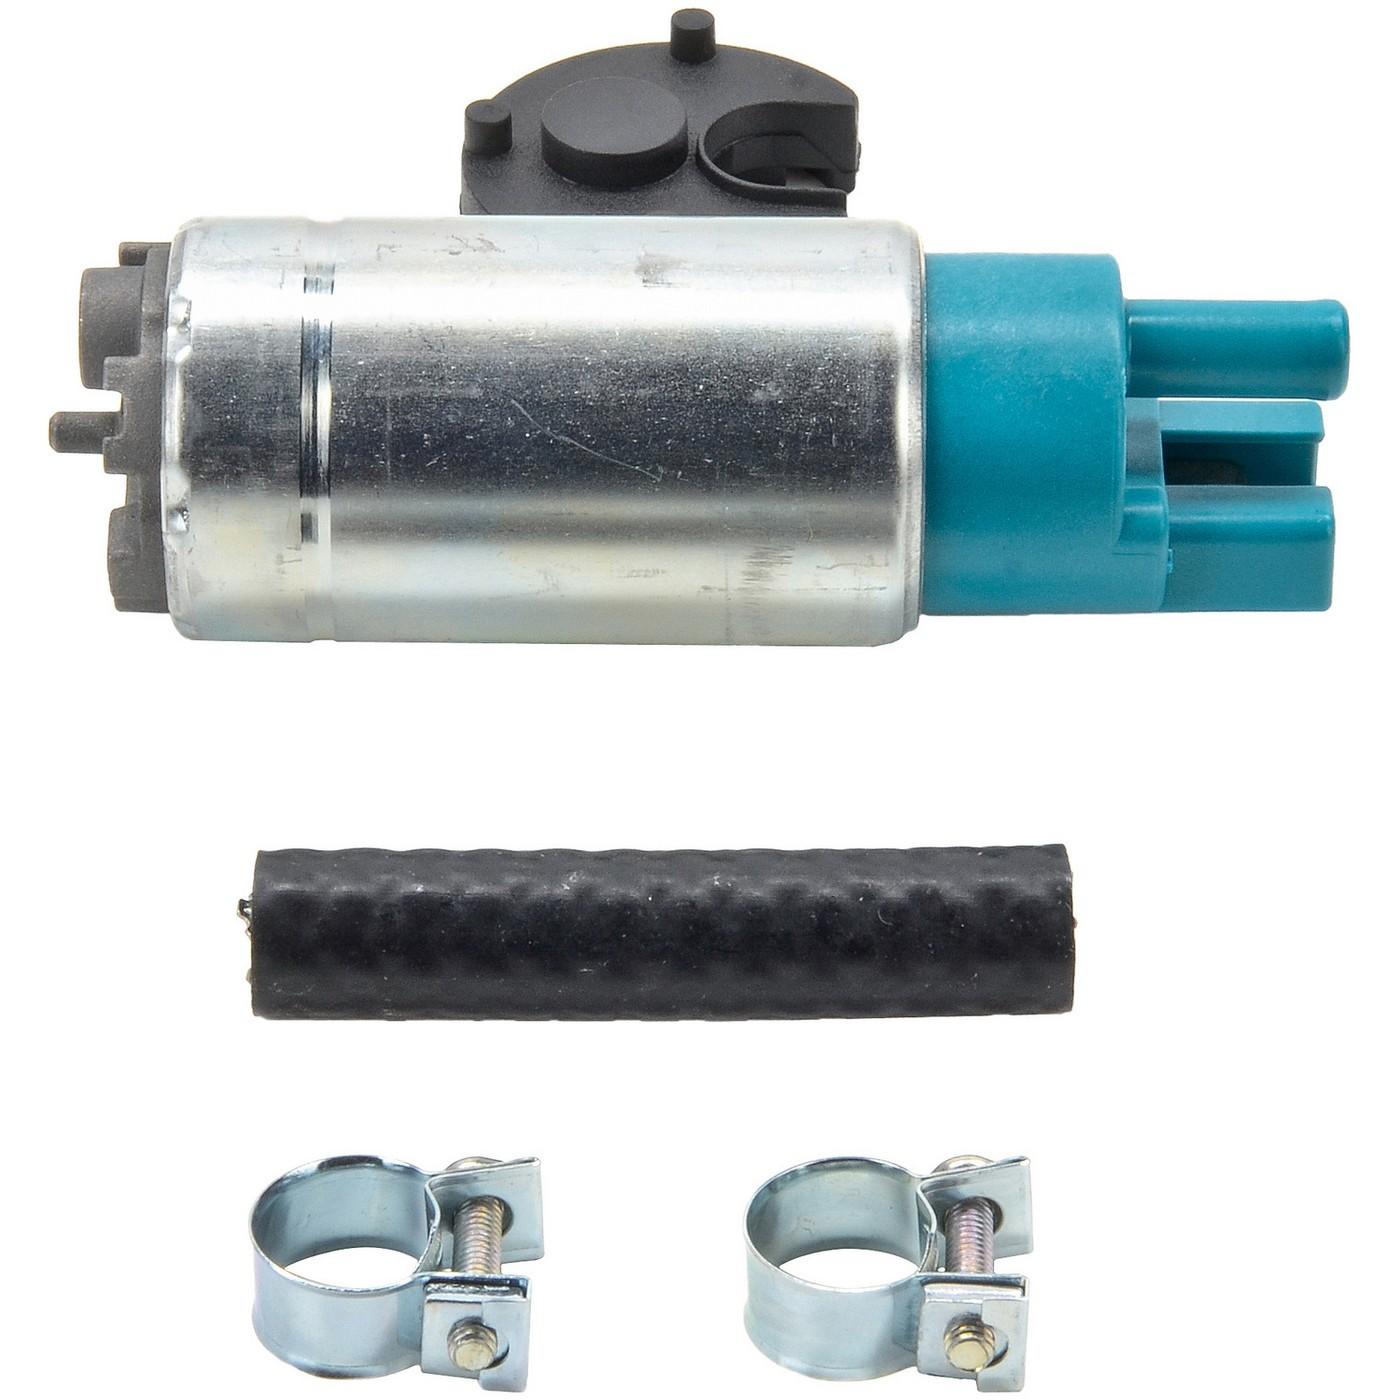 Bosch 69544 Original Equipment Replacement Electric Fuel Pump